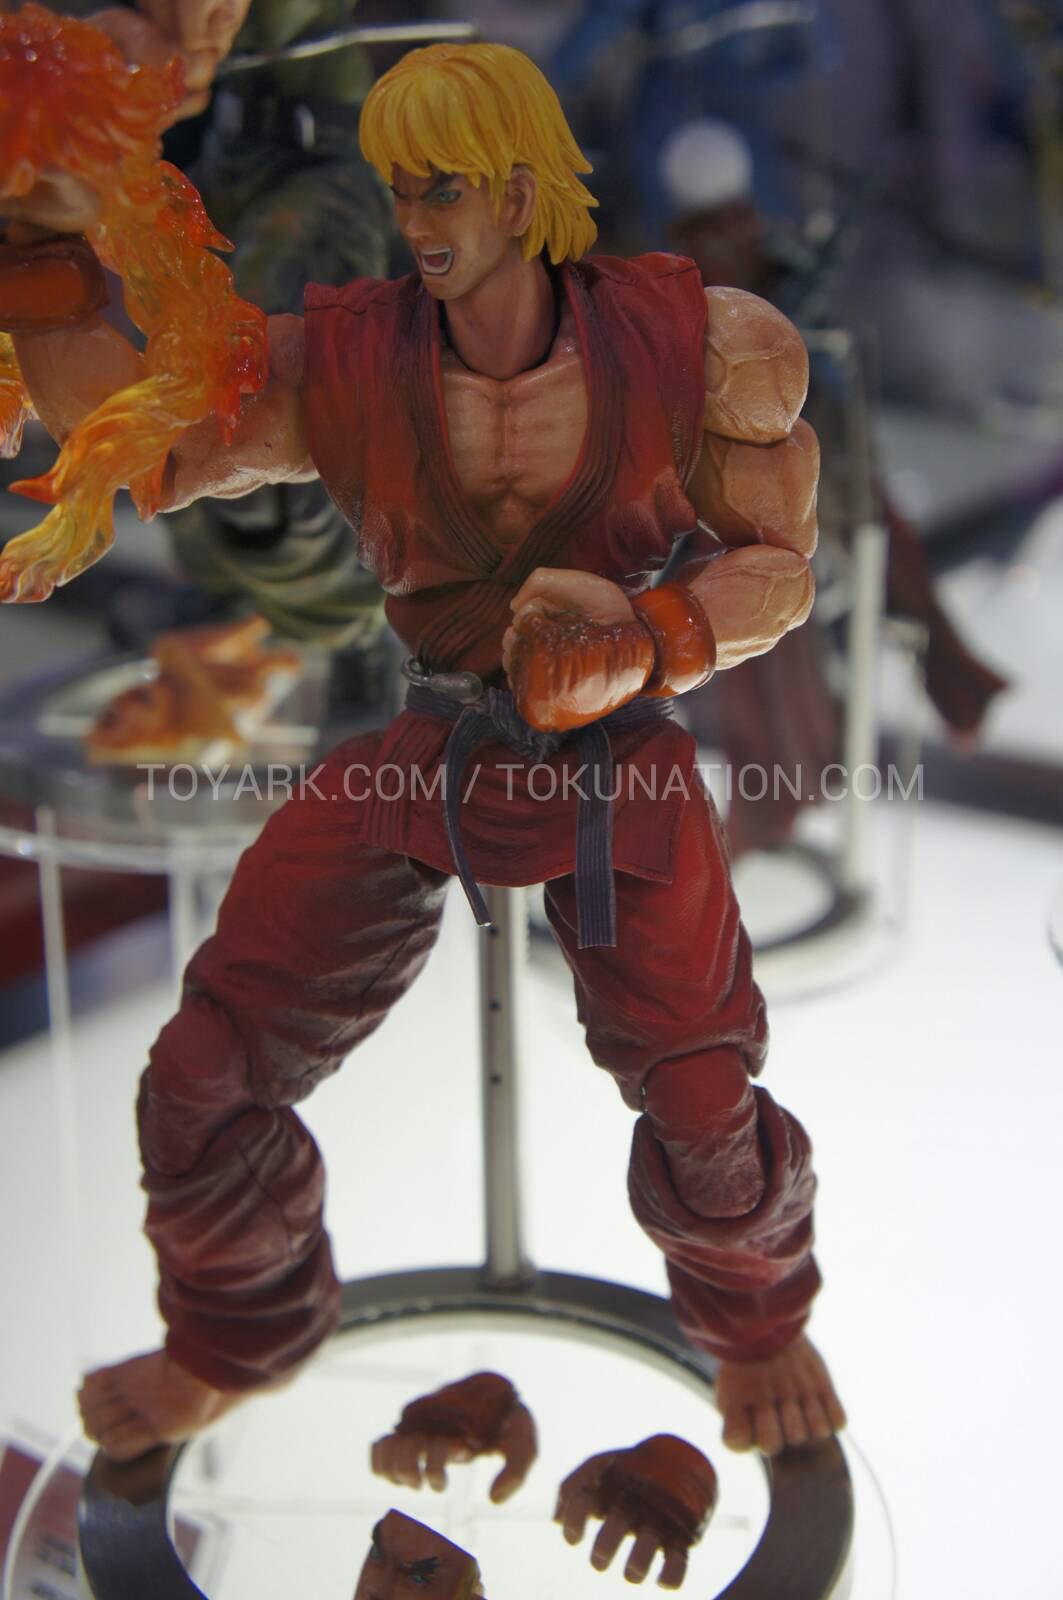 Play Arts Kai positionable figurines #03